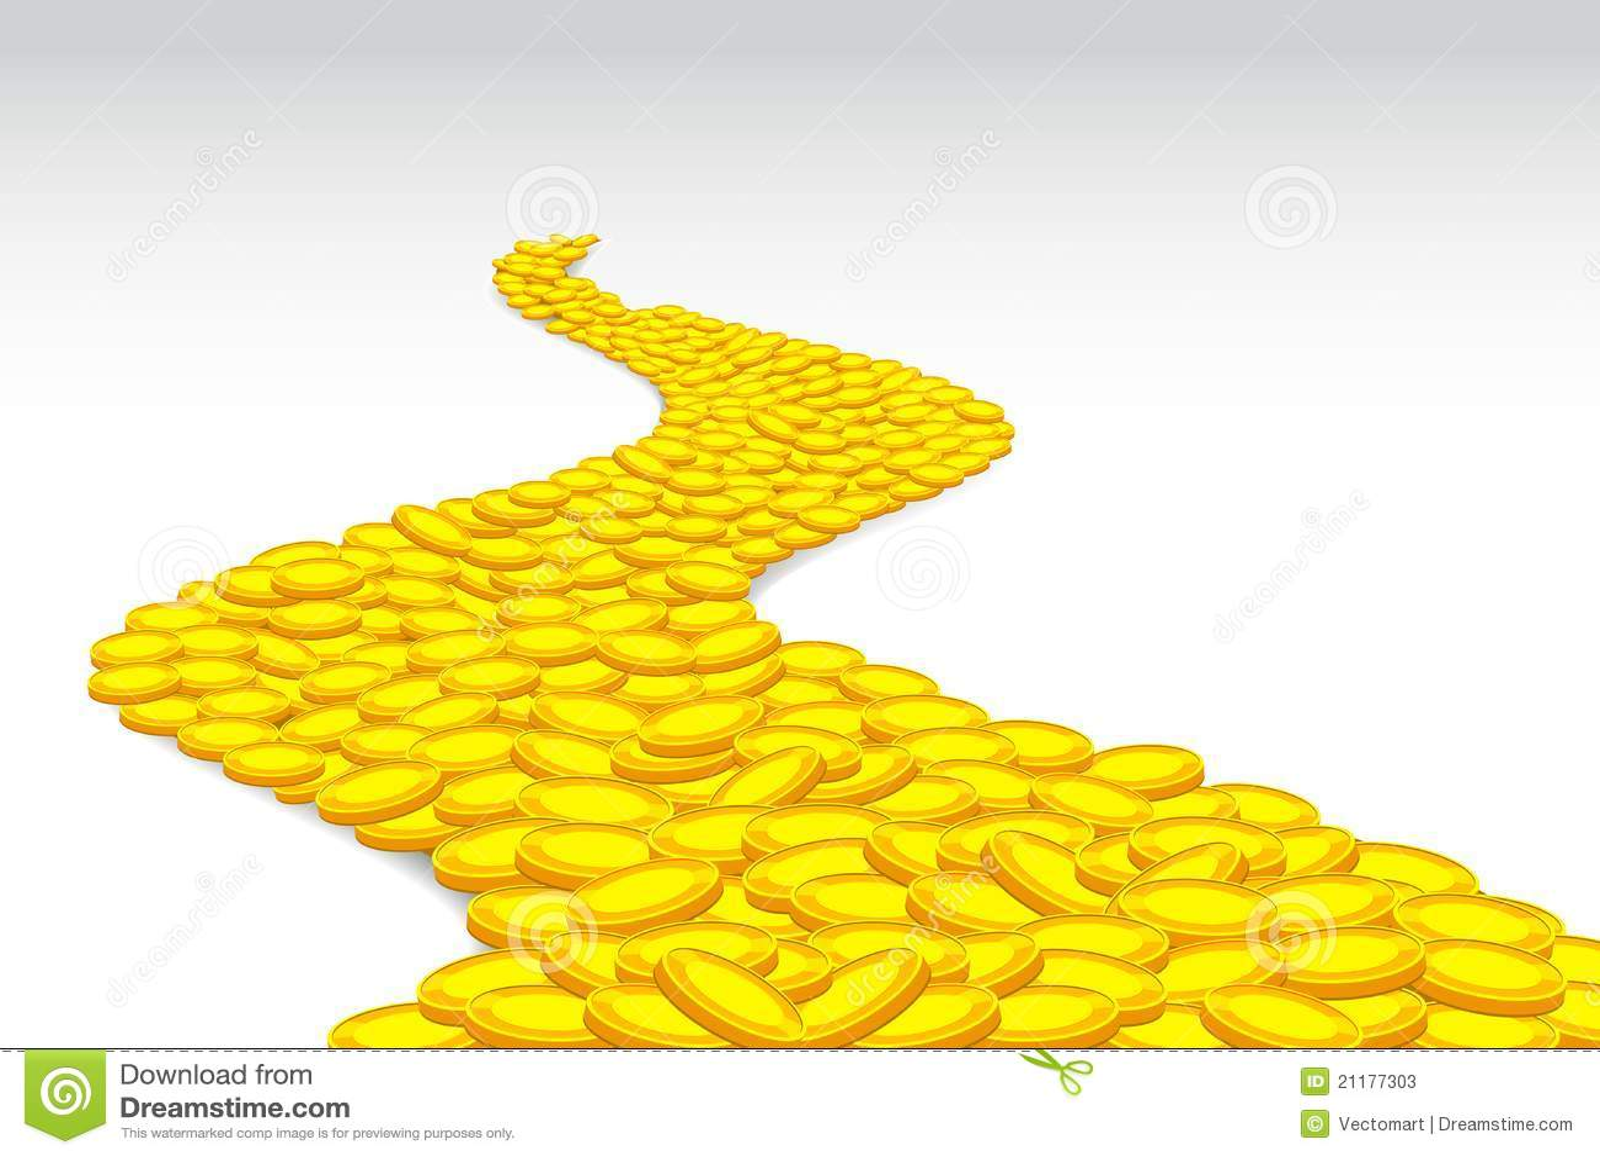 дорога монетки